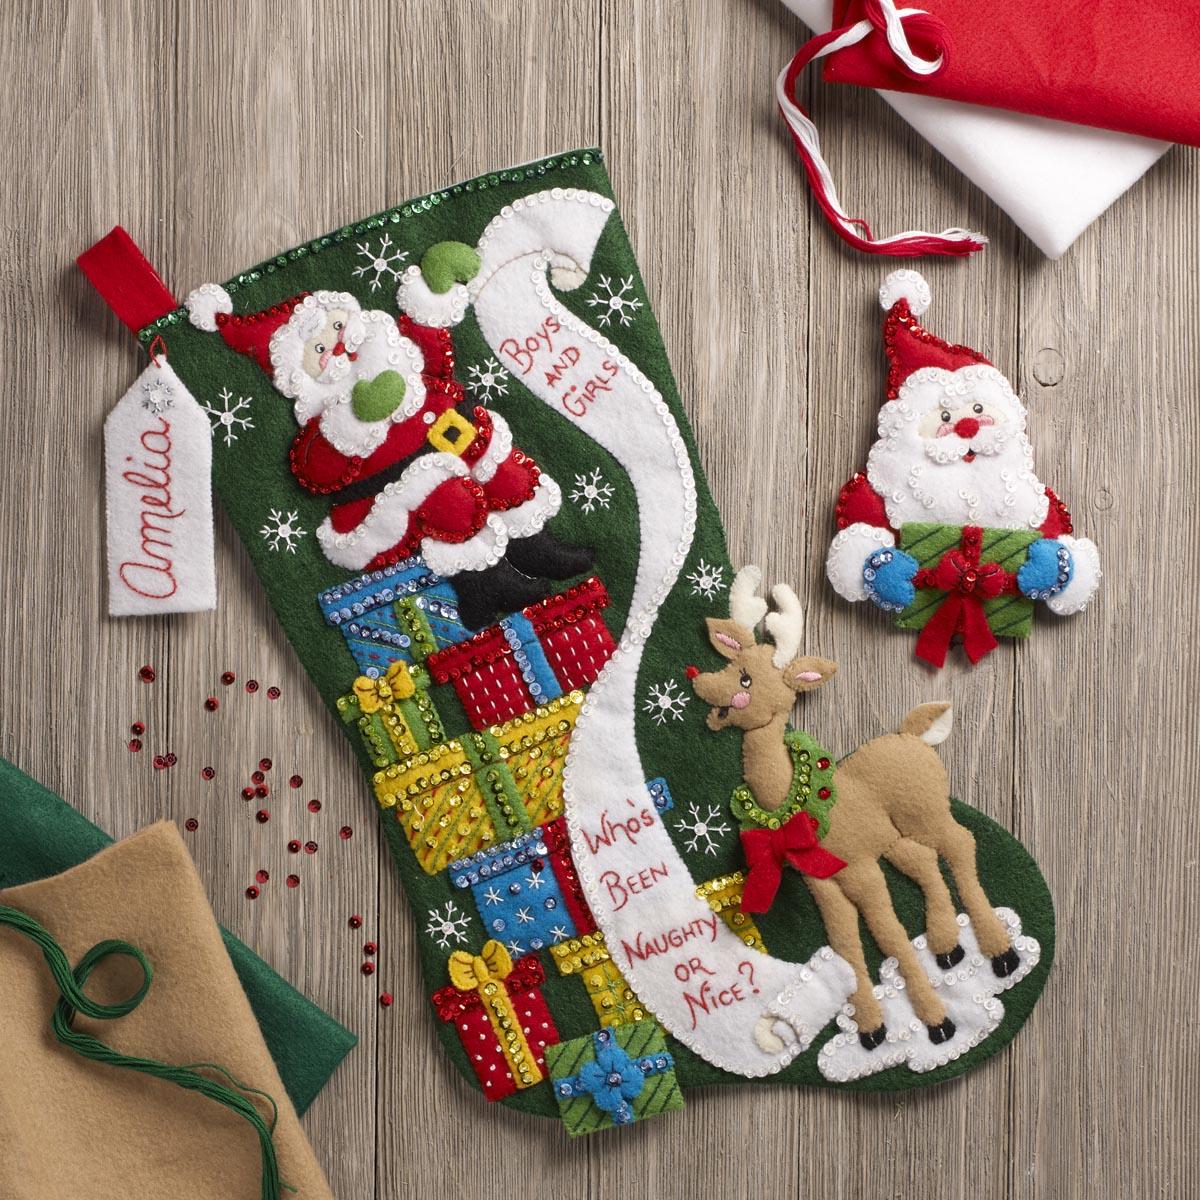 Bucilla ® Seasonal - Felt - Stocking Kits - The List